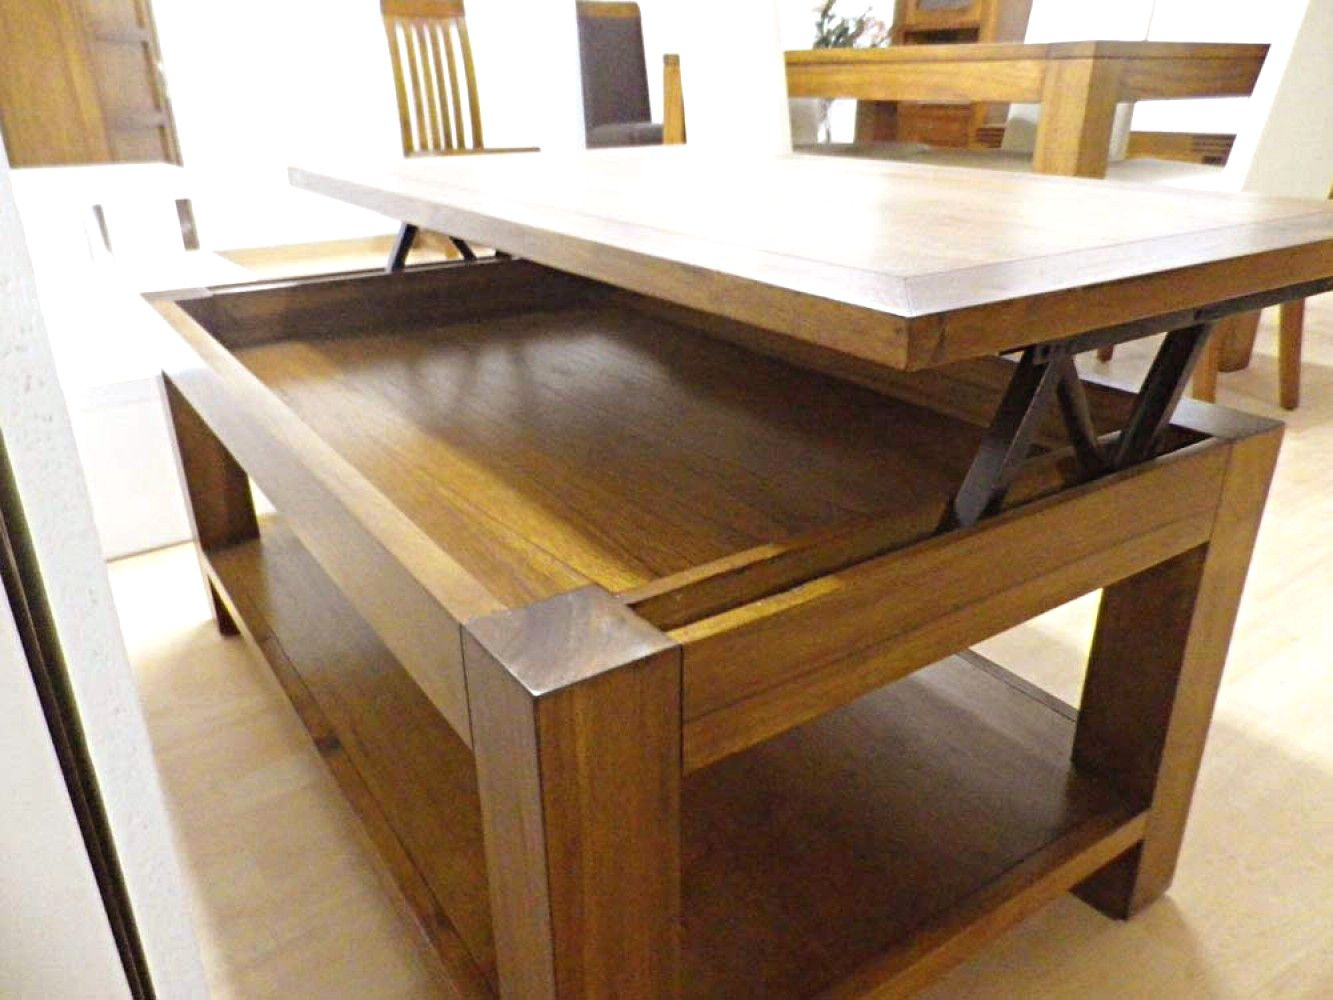 Table Basse Relevable En Bois Avec Table Basse Relevable En Bois